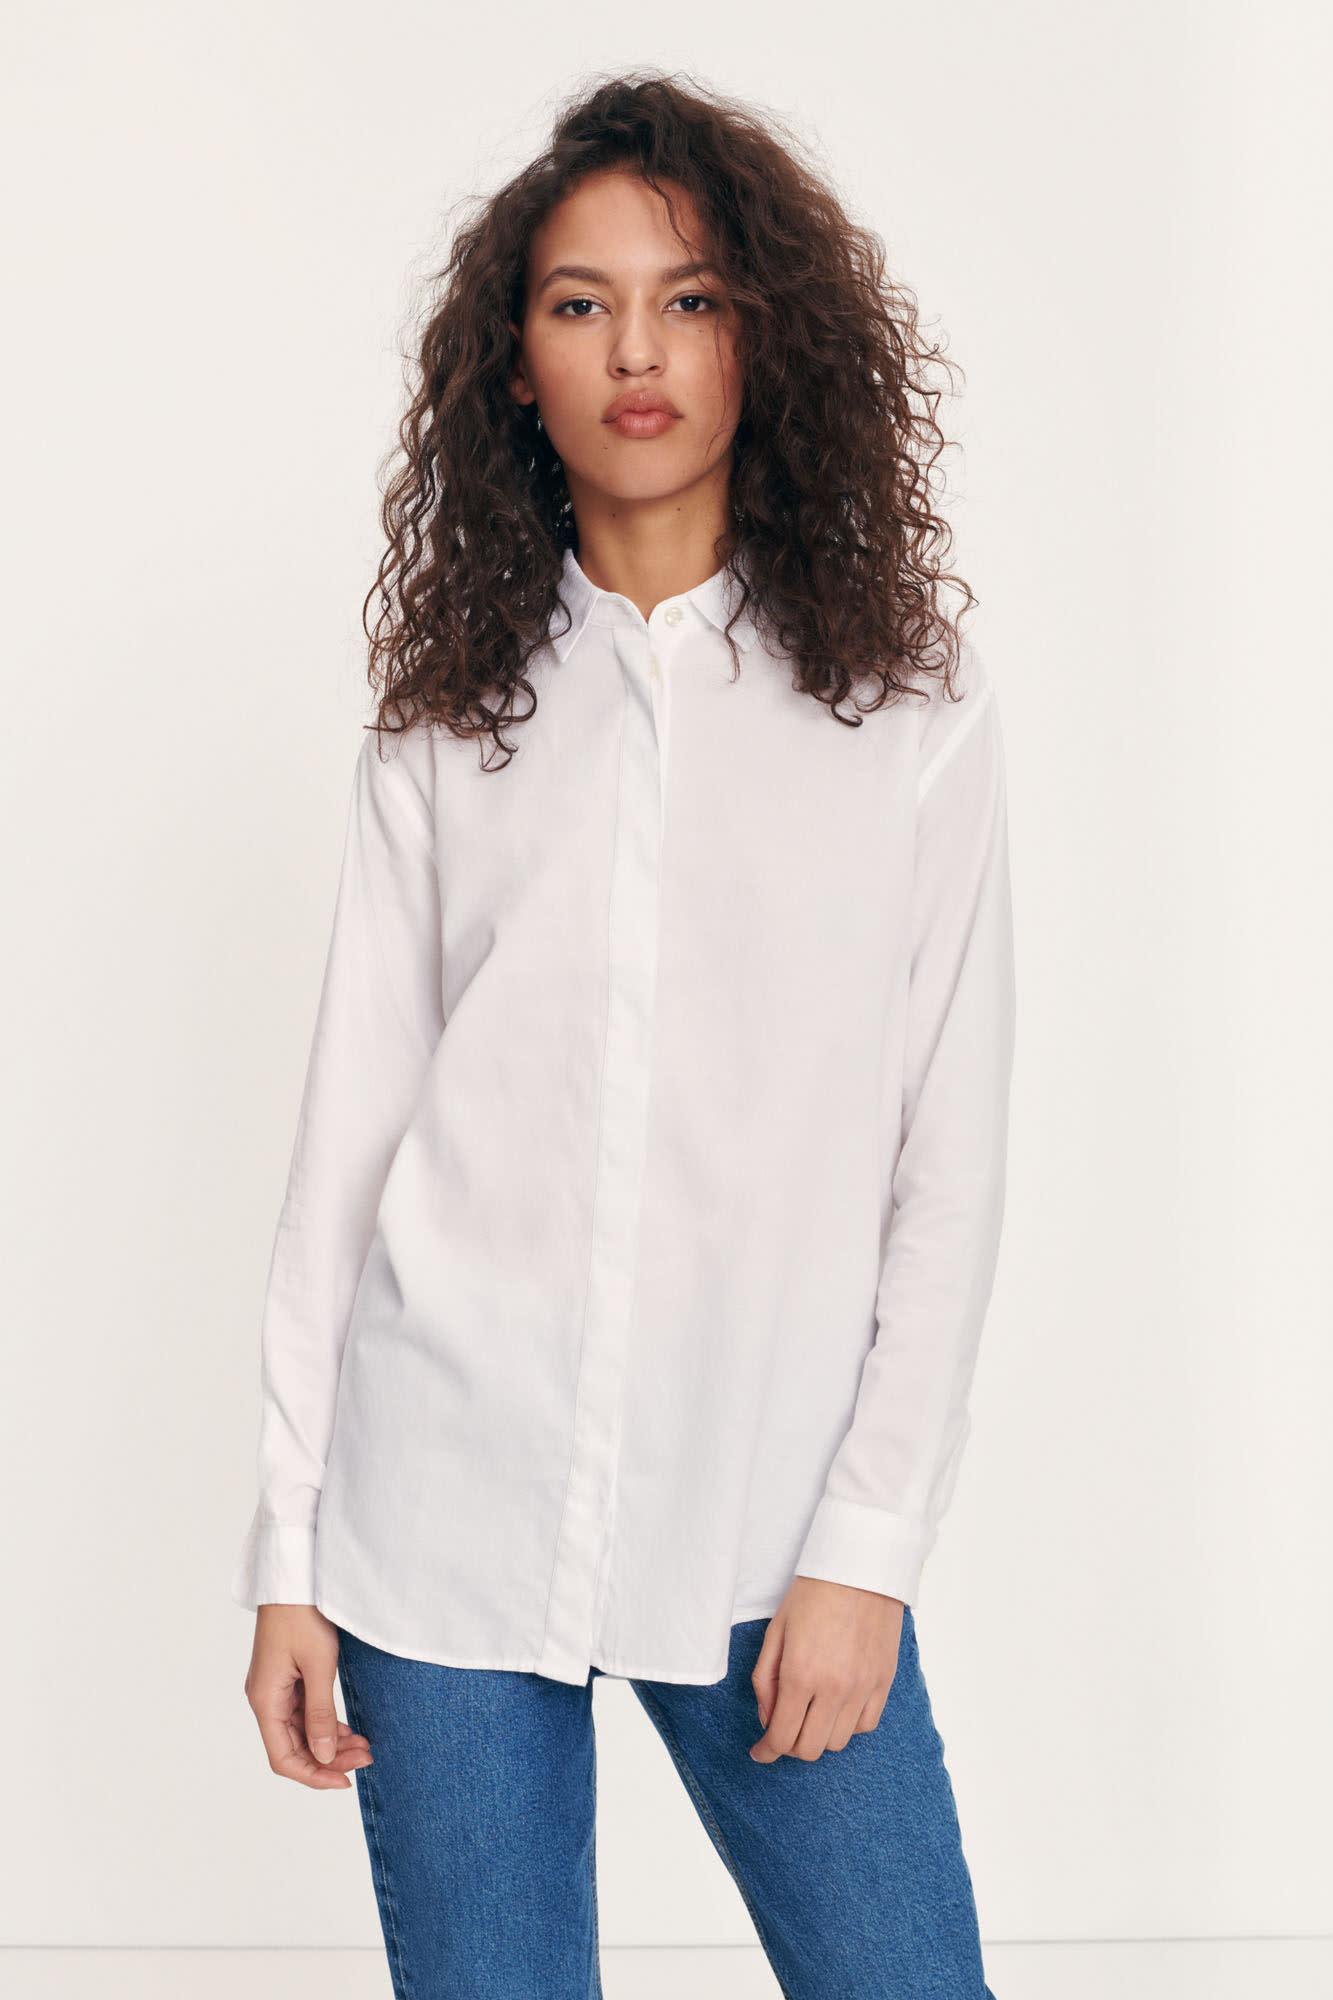 Caico Basic Shirt Wit 2634-1